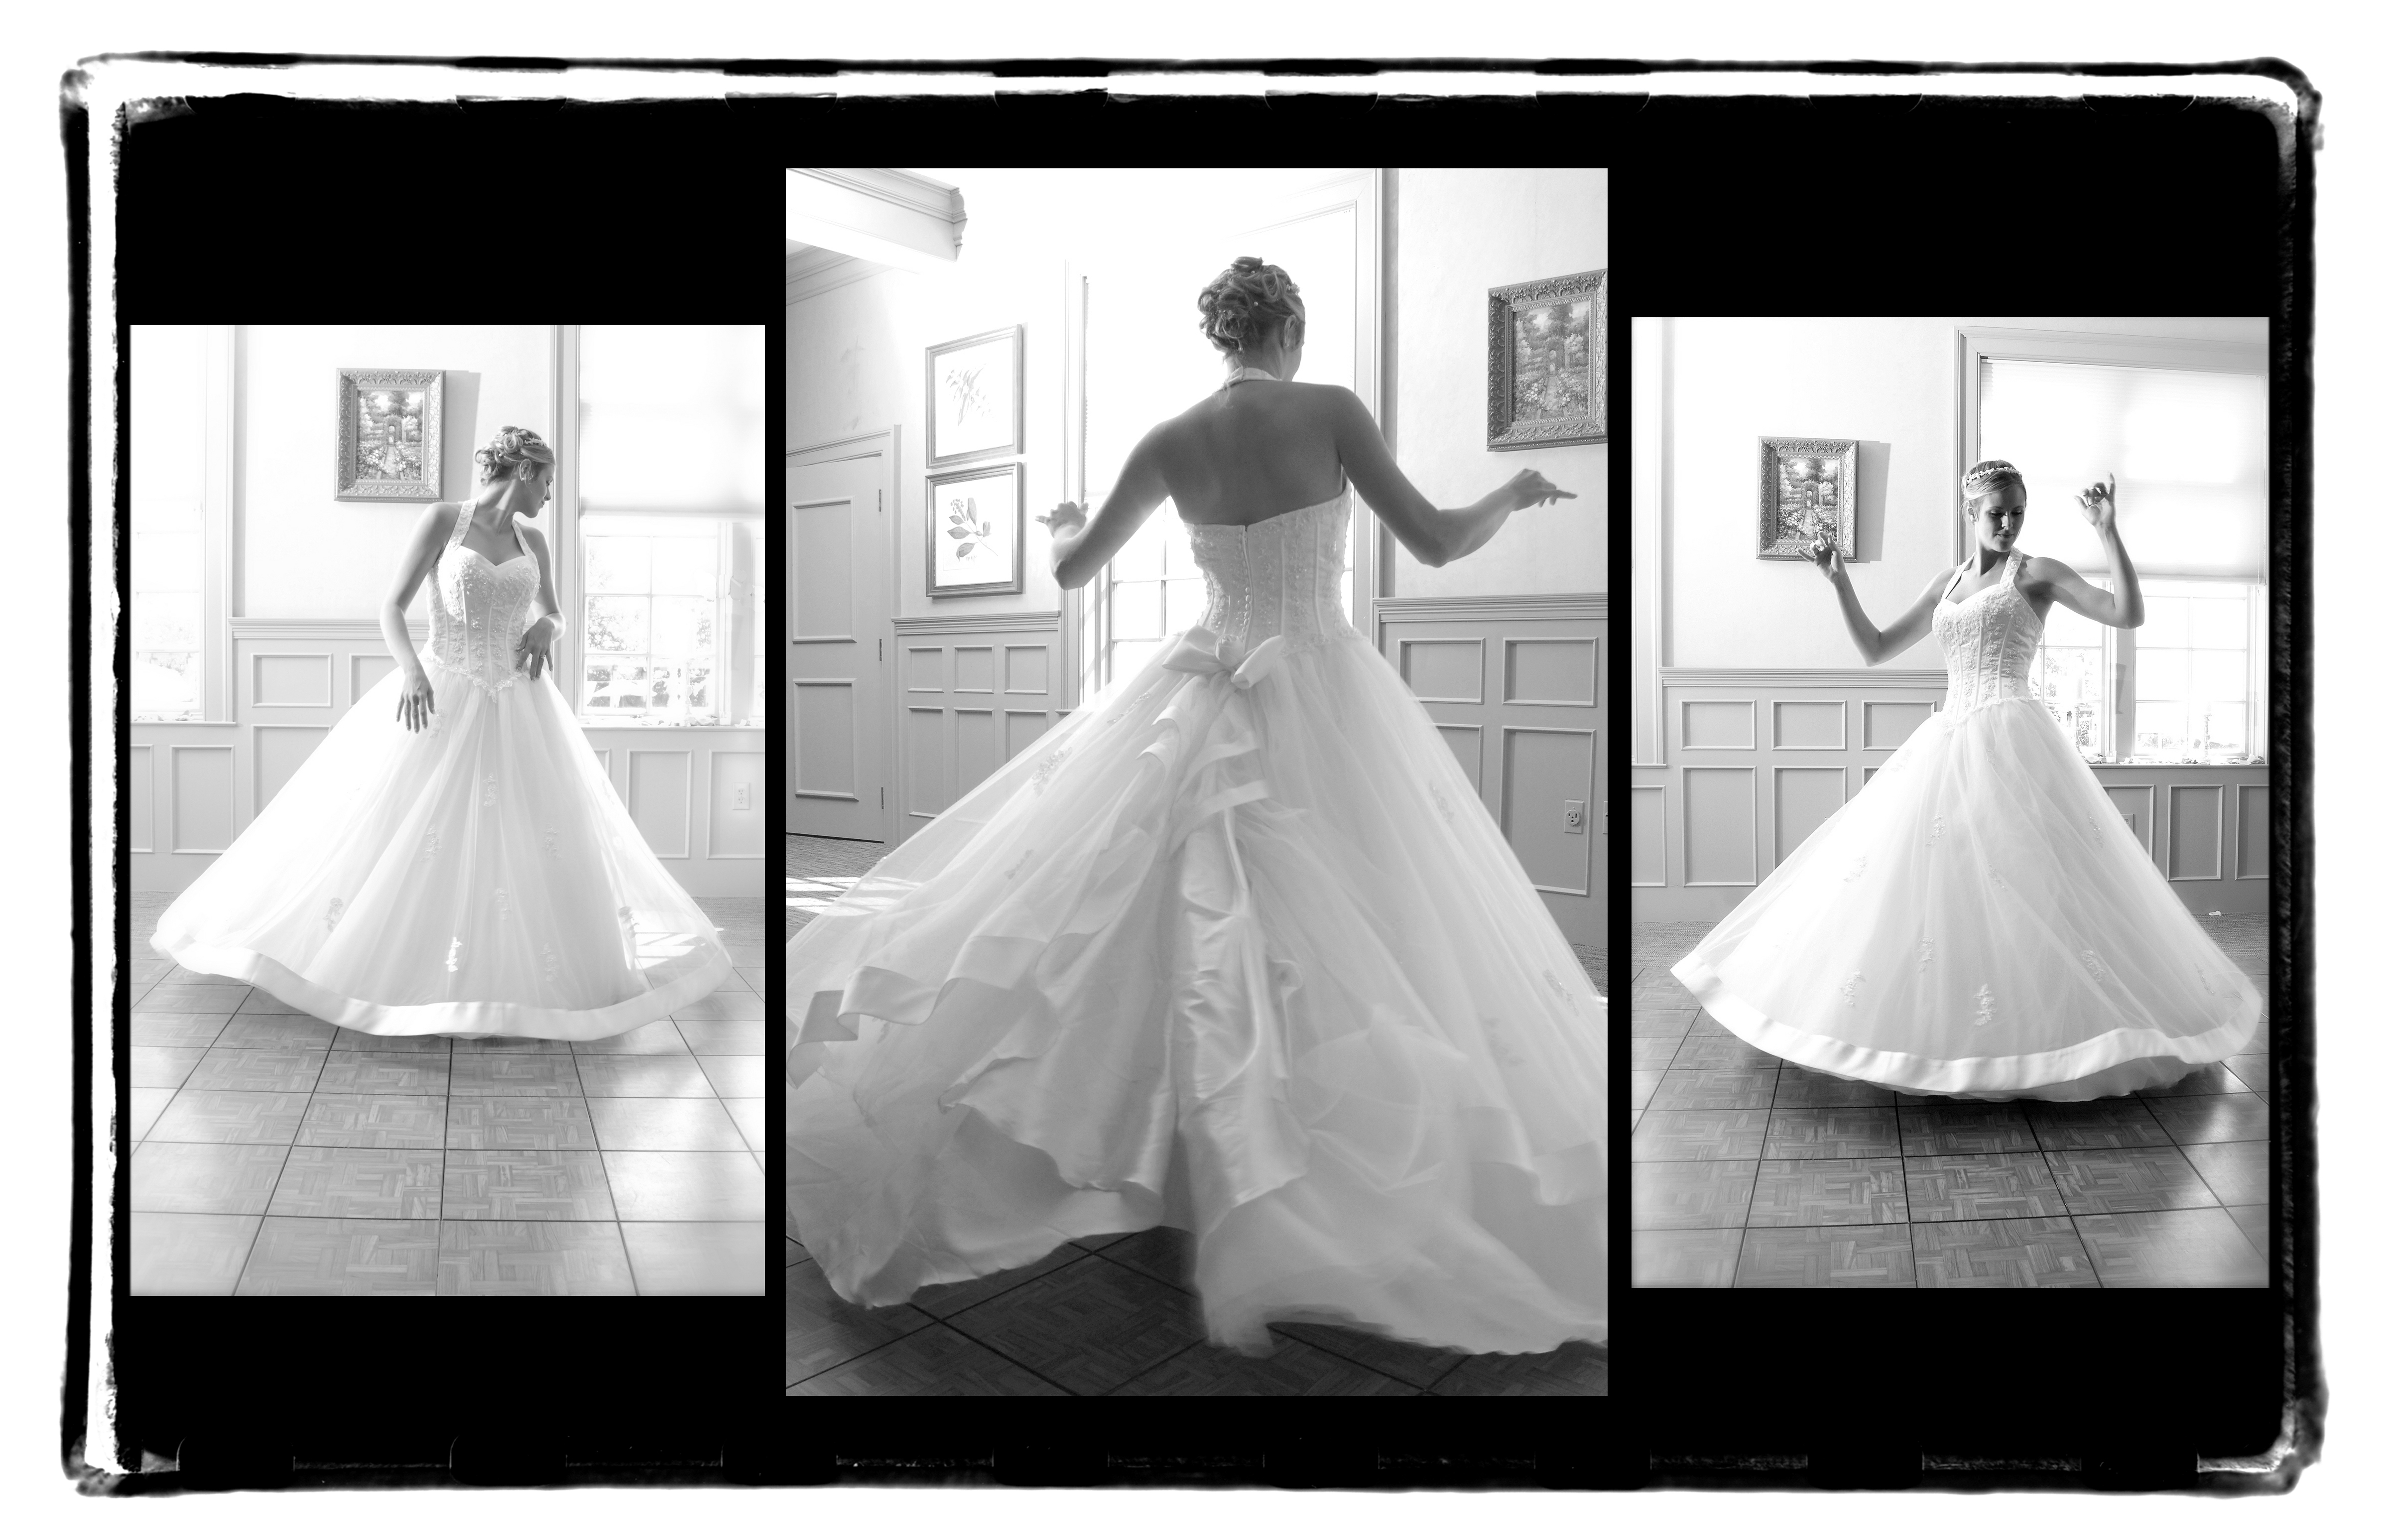 Reception, Flowers & Decor, Photography, Bride, Gown, Dance, Bustle, Matt, Dancefloor, Matt andrews photography, Lindsey, Andrews, Spinning, Wolburg